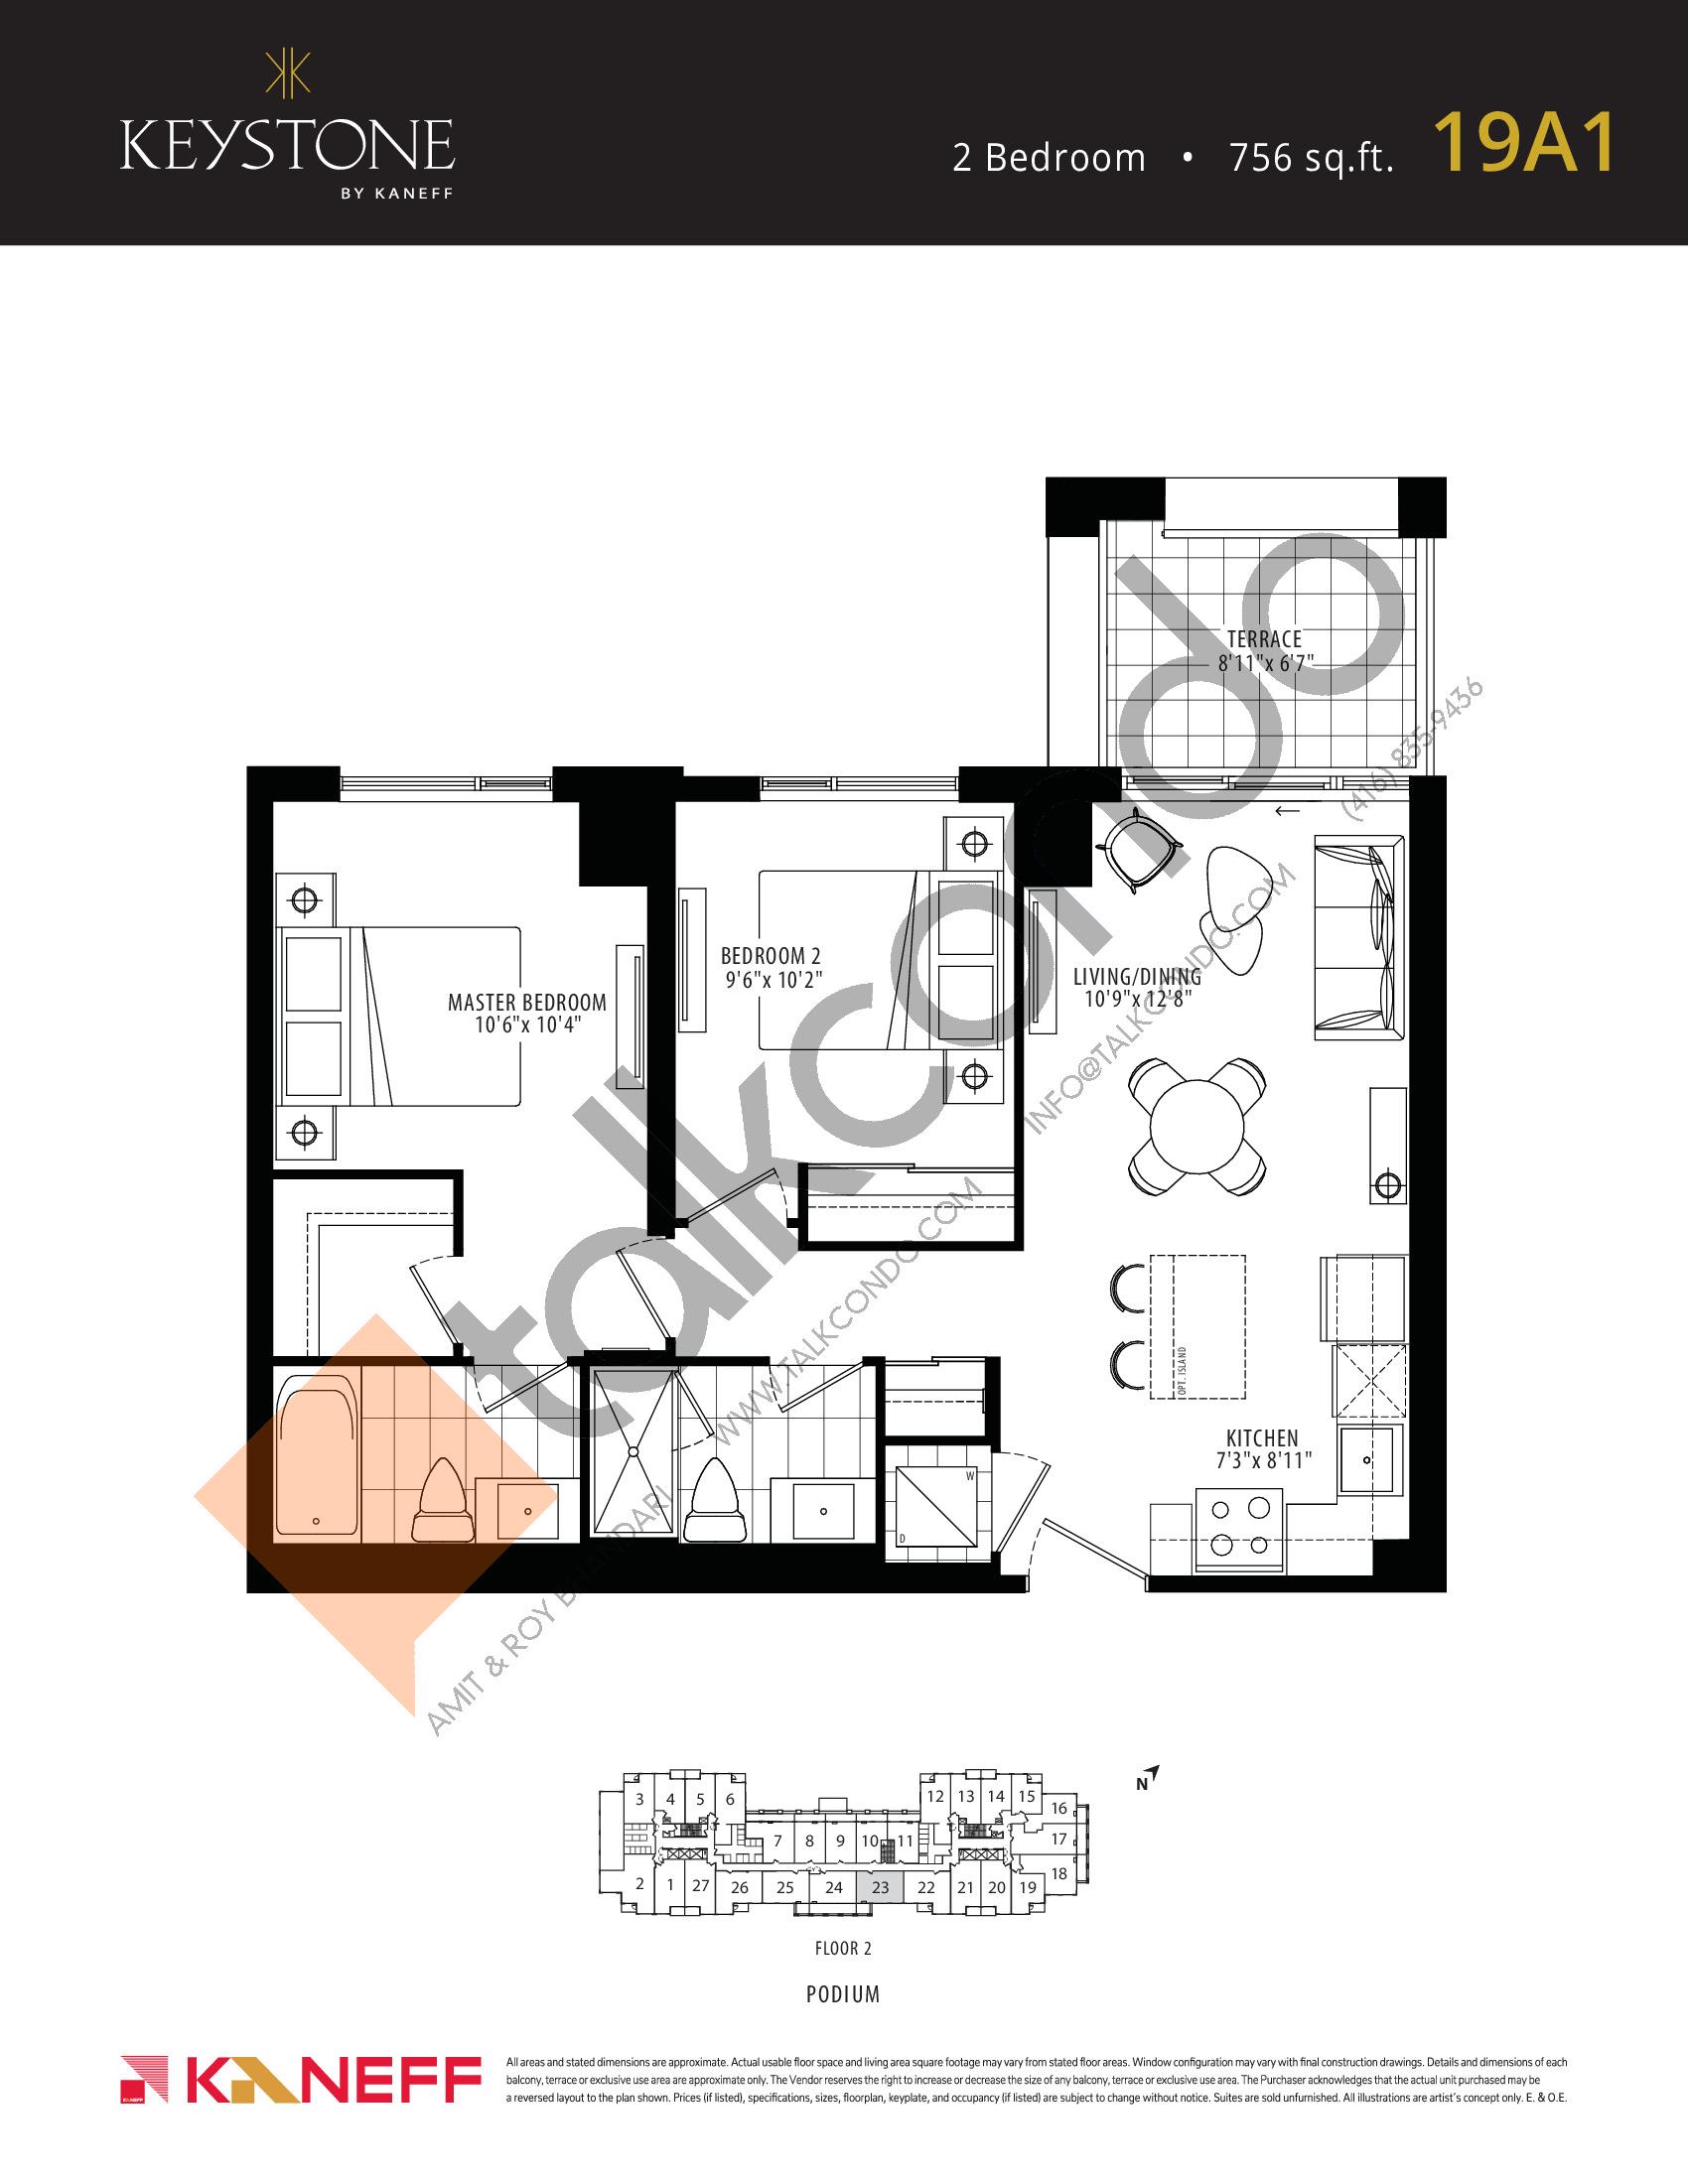 19A1 Floor Plan at Keystone Condos Phase 2 - 756 sq.ft